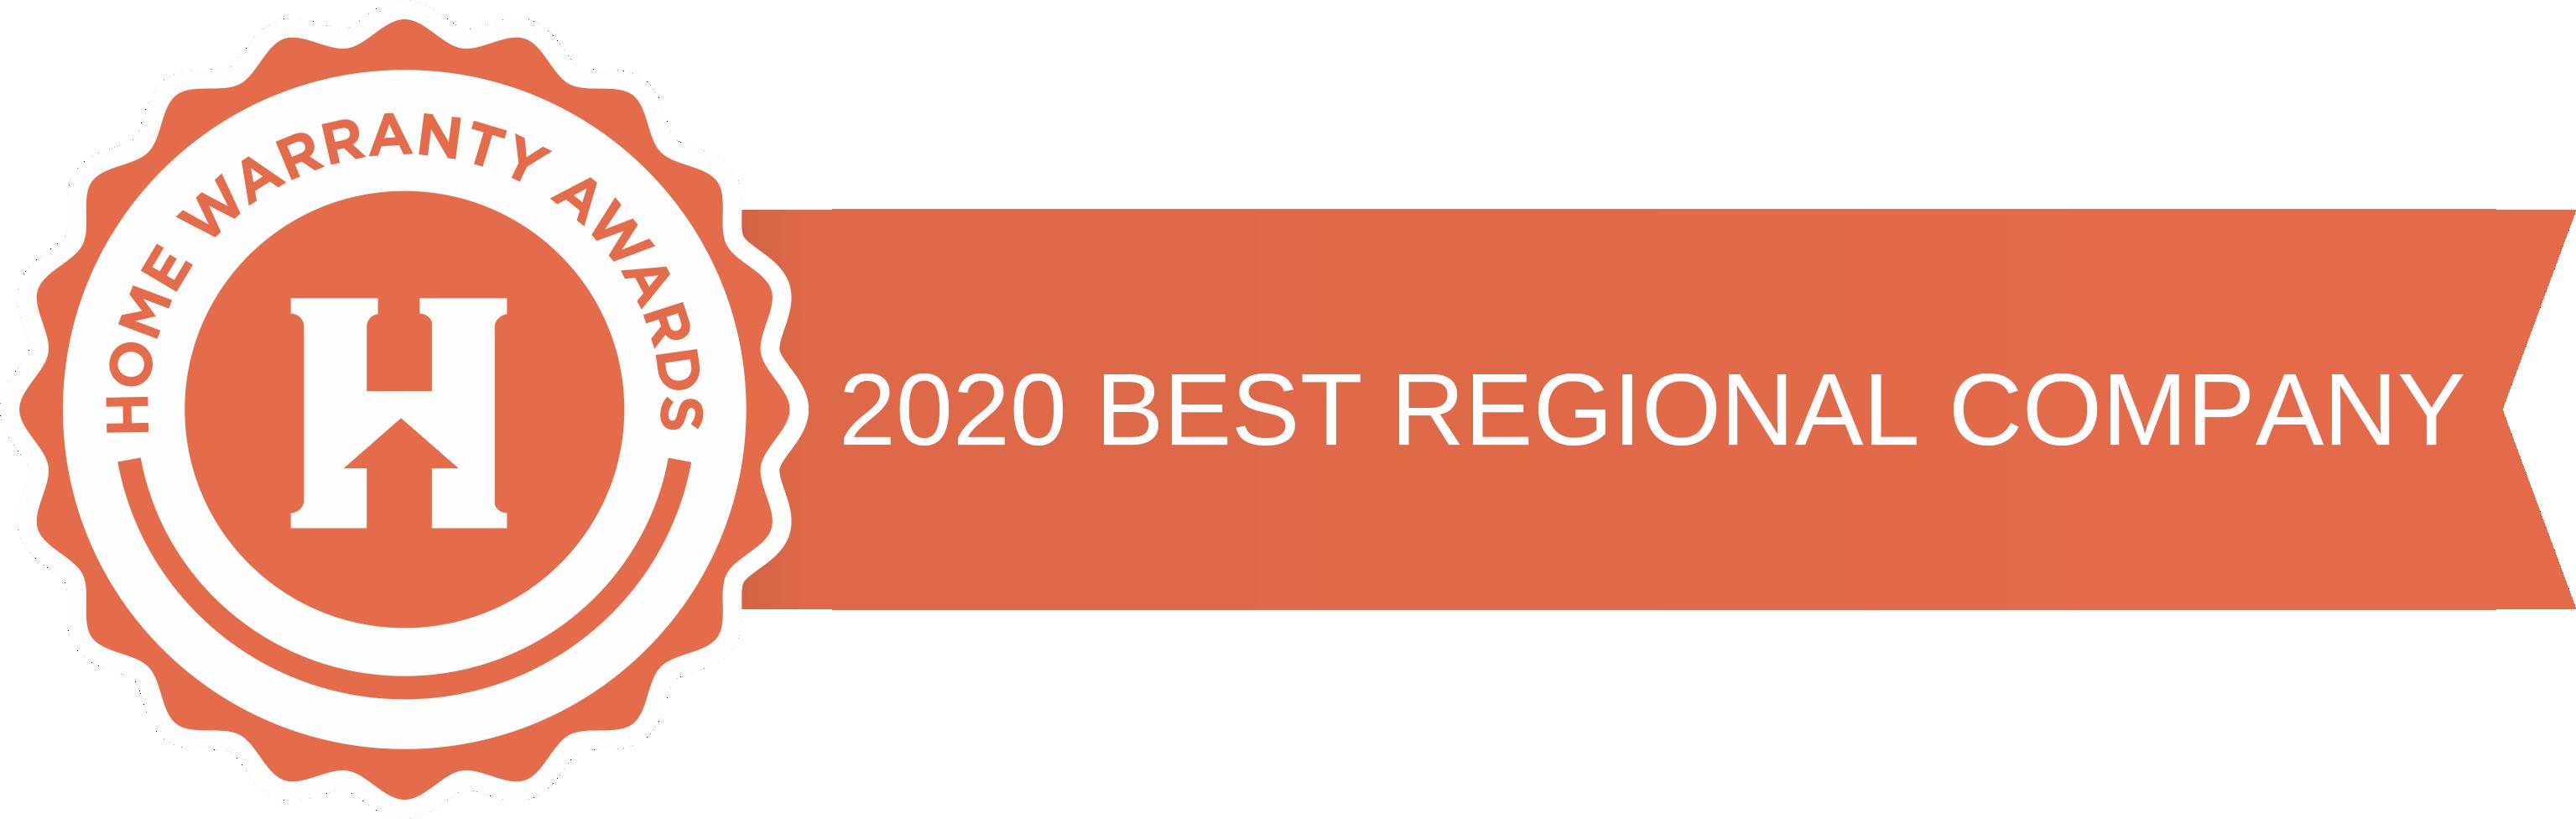 Best Regional Company